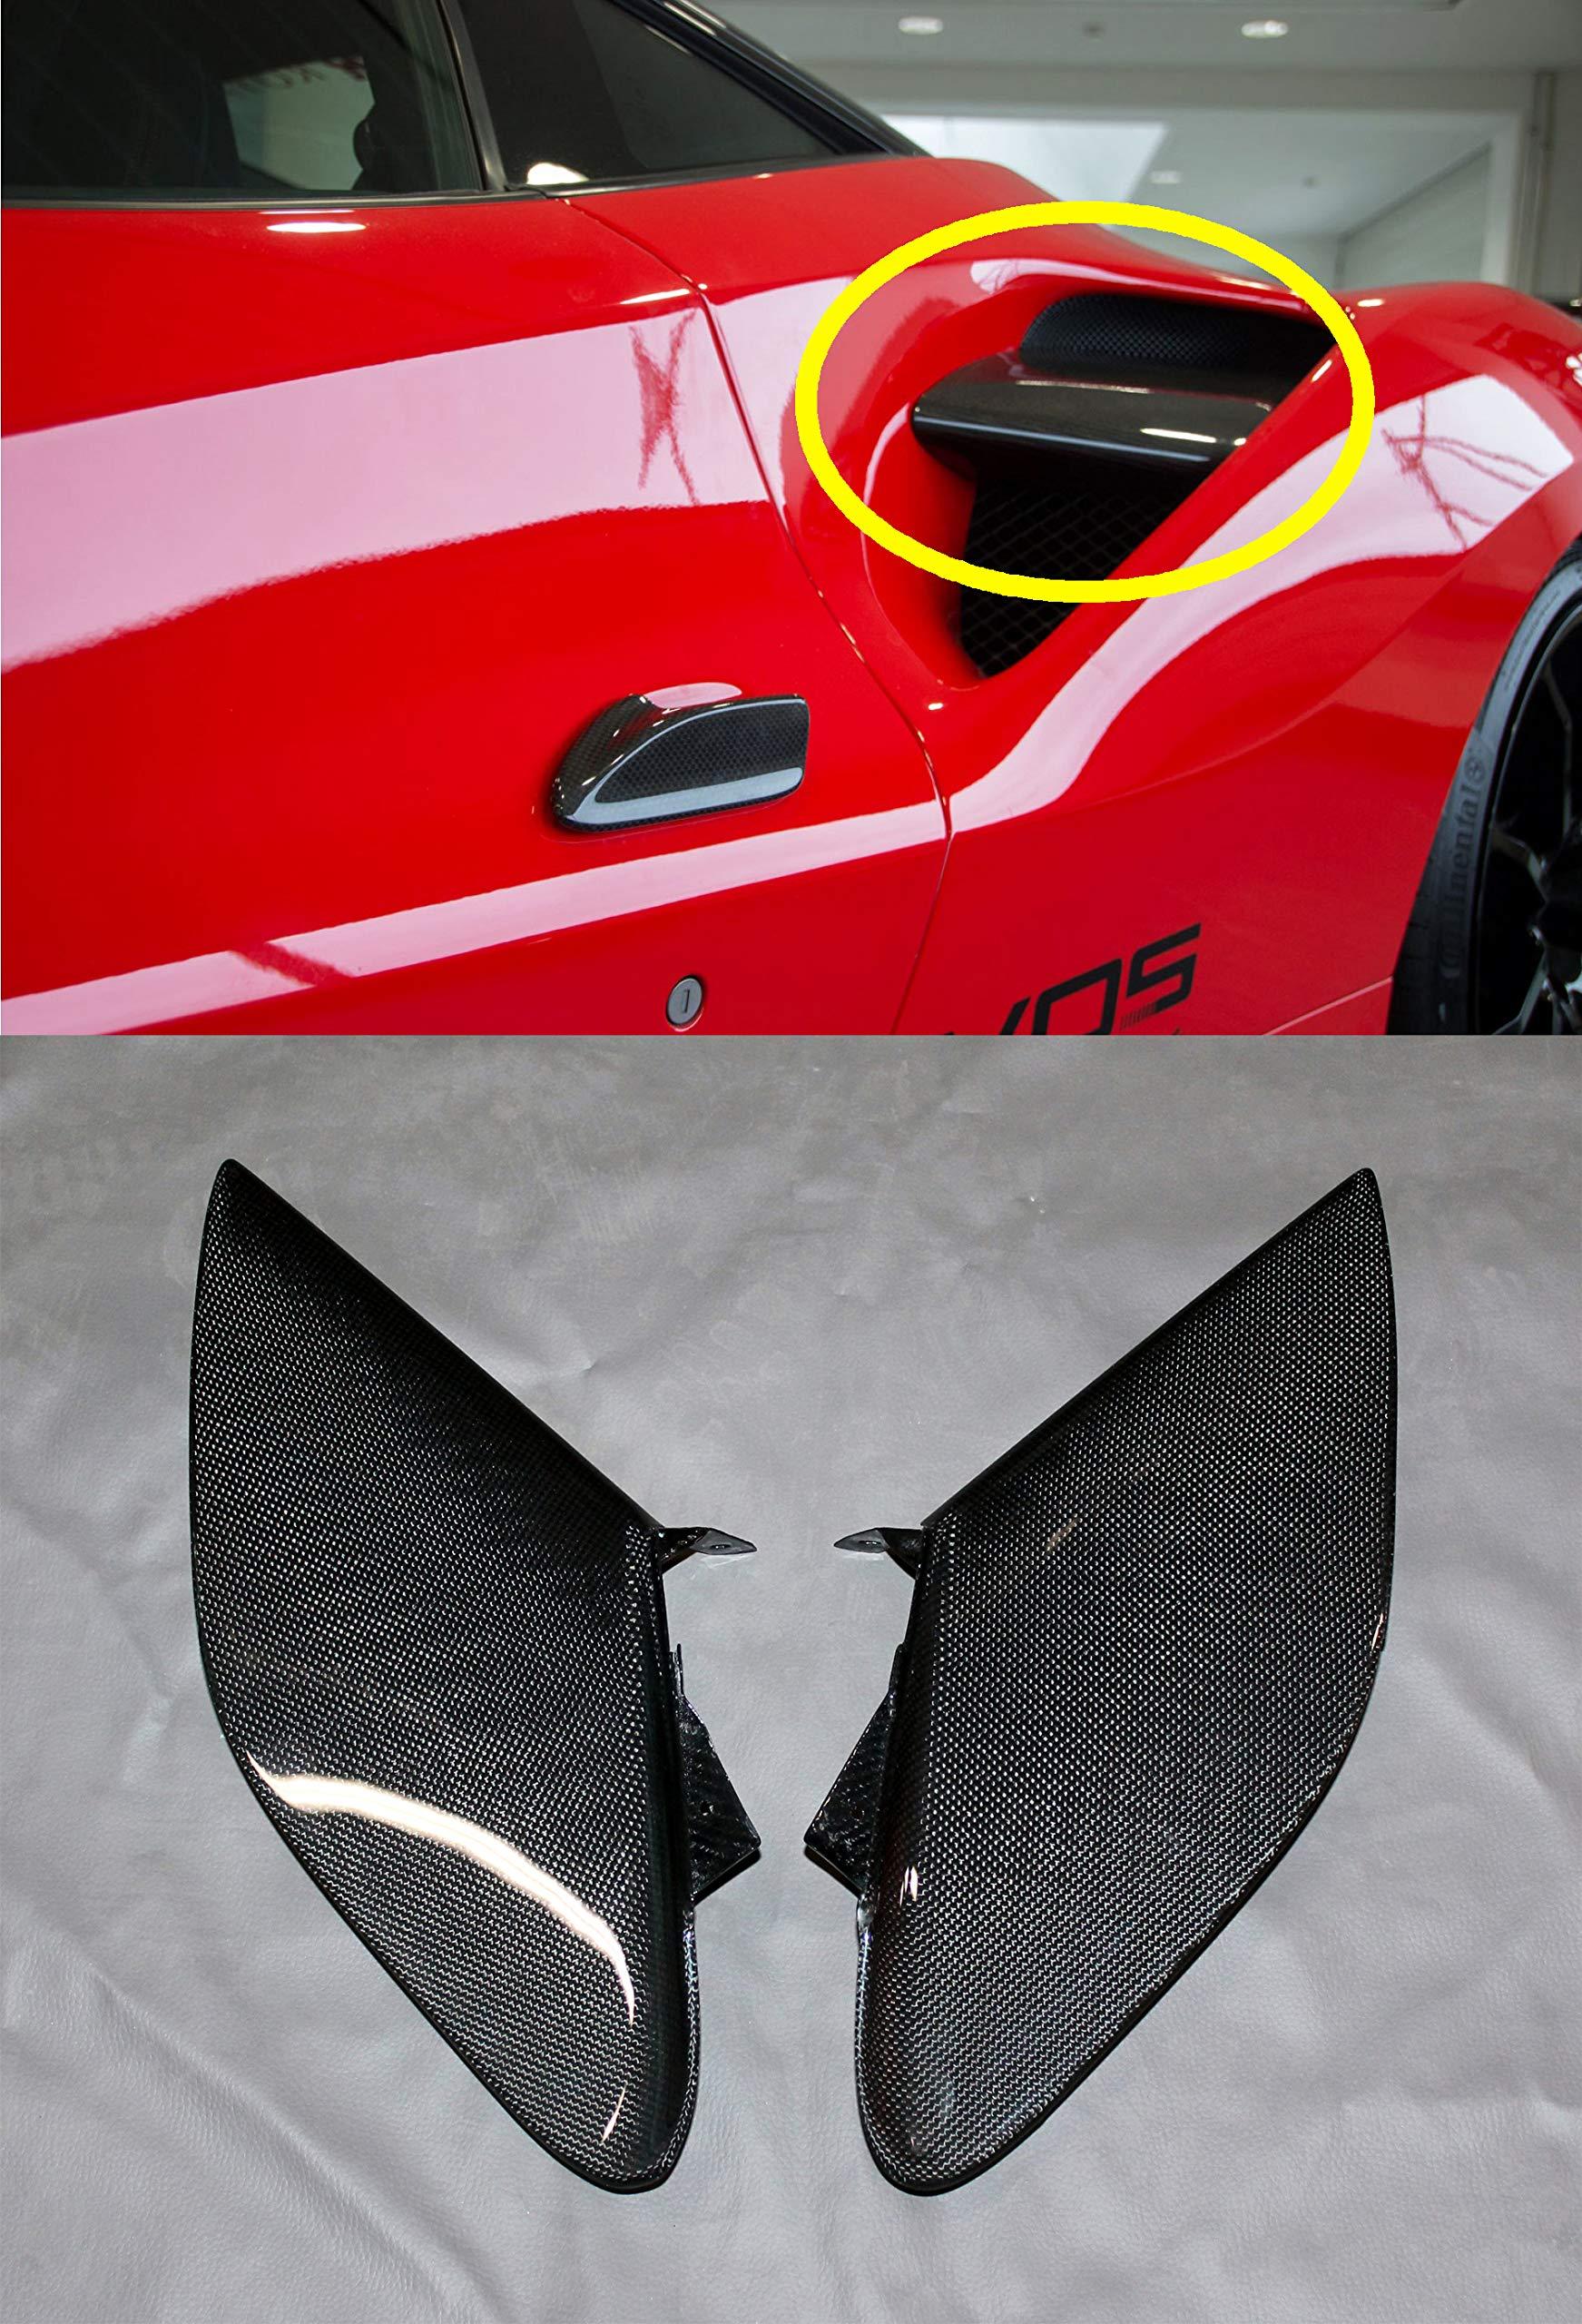 Ferrari style – Carbon Fiber 1x1 Plain Weave – Side Air Intake Flaps Trim – Air Vent Cover set 2 pcs – for Ferrari 488 GTB